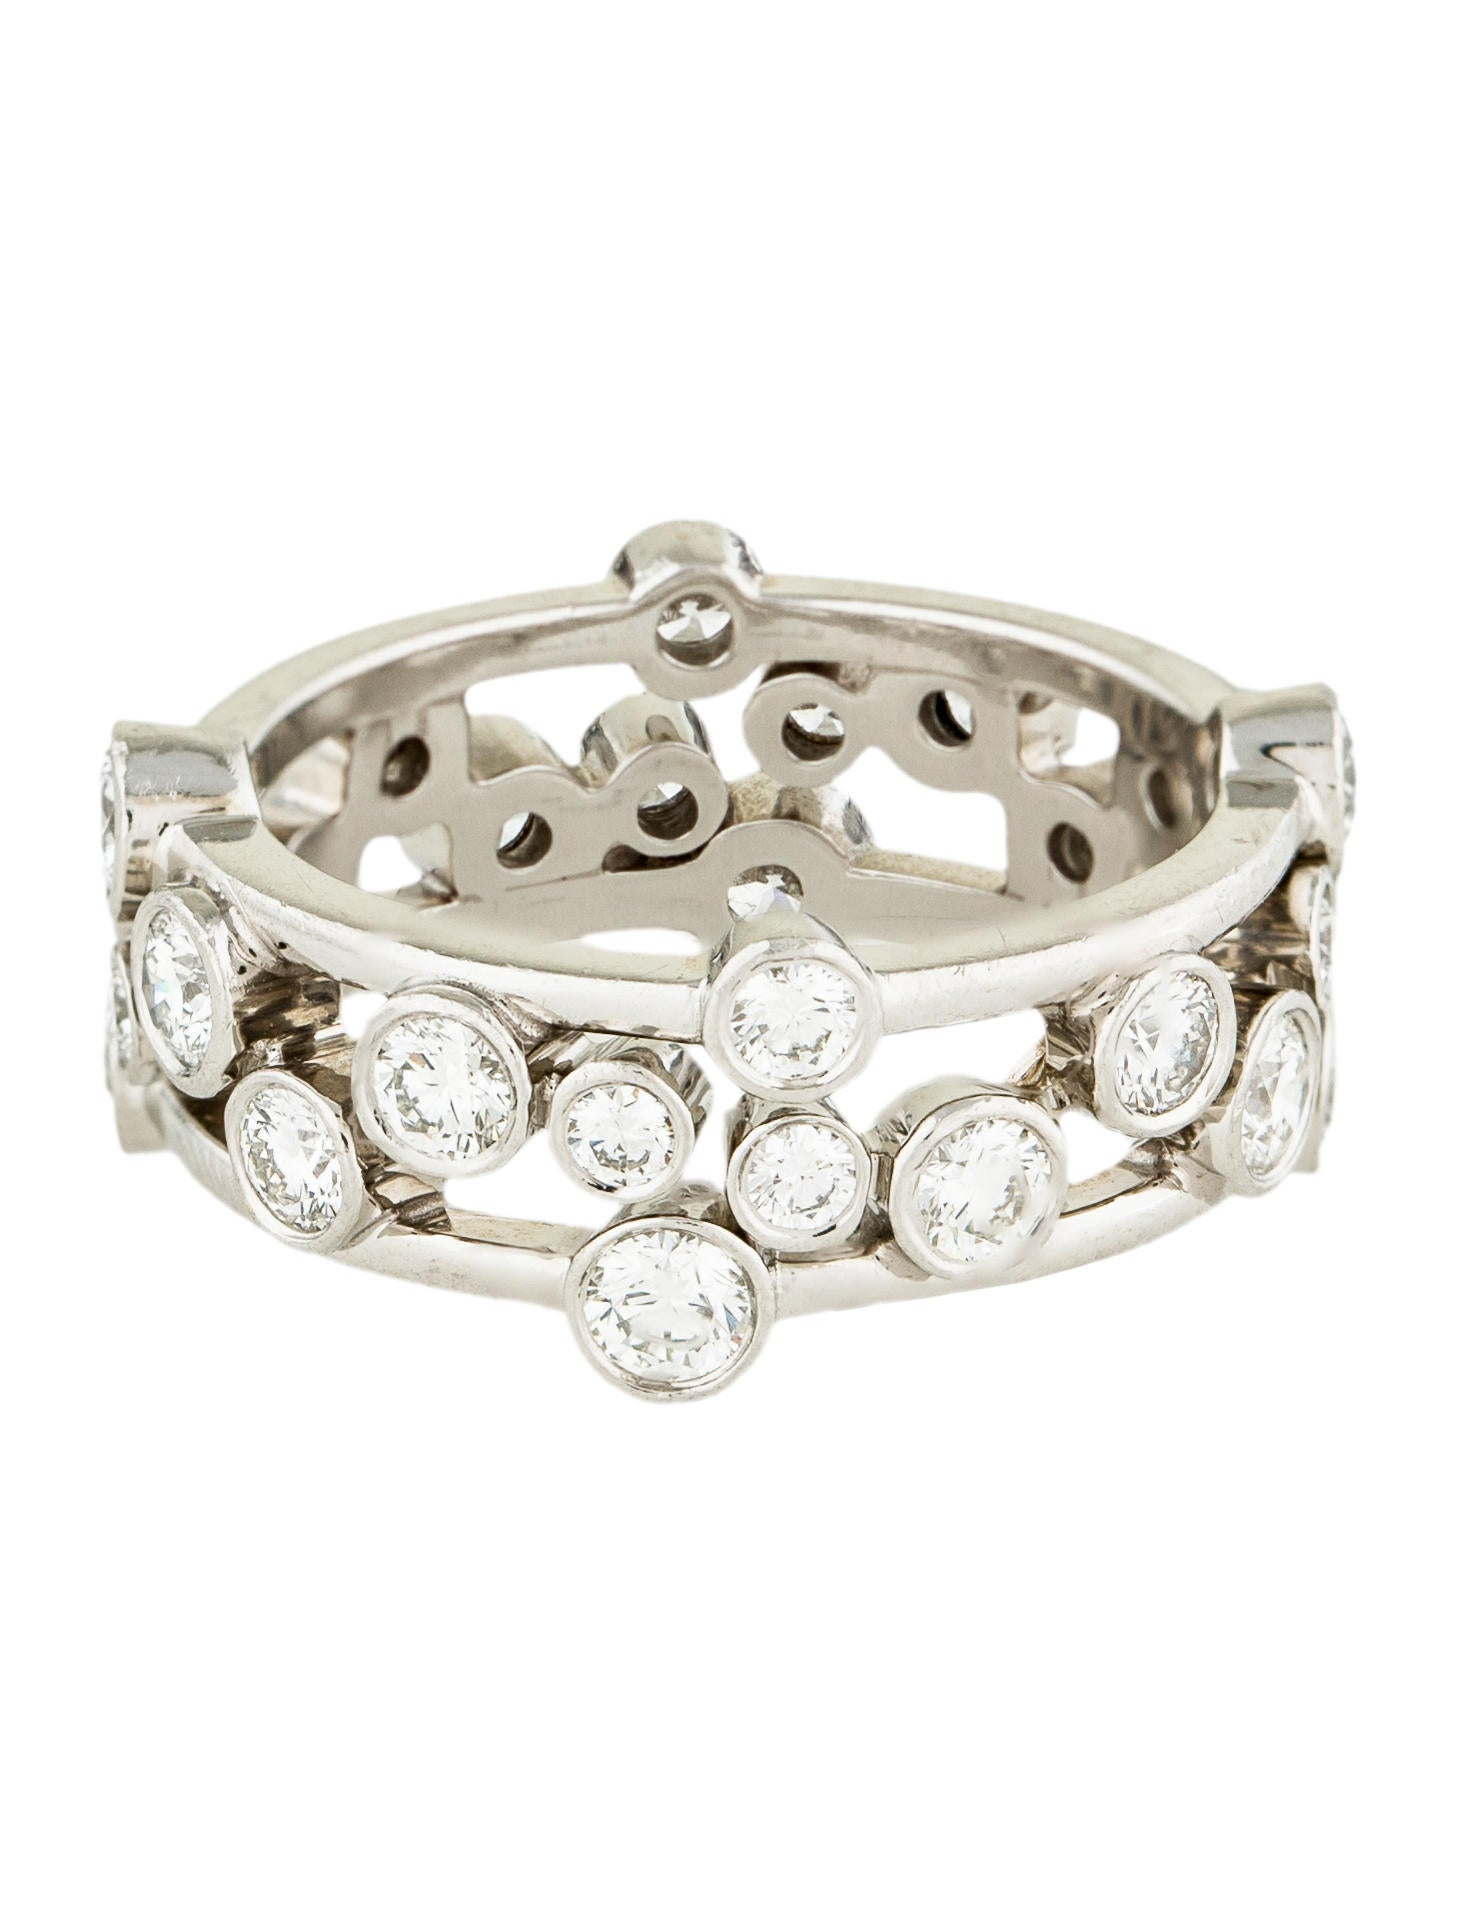 317fa4ba9 Tiffany & Co. Platinum Diamond Bubbles Ring - Rings - TIF54208   The ...